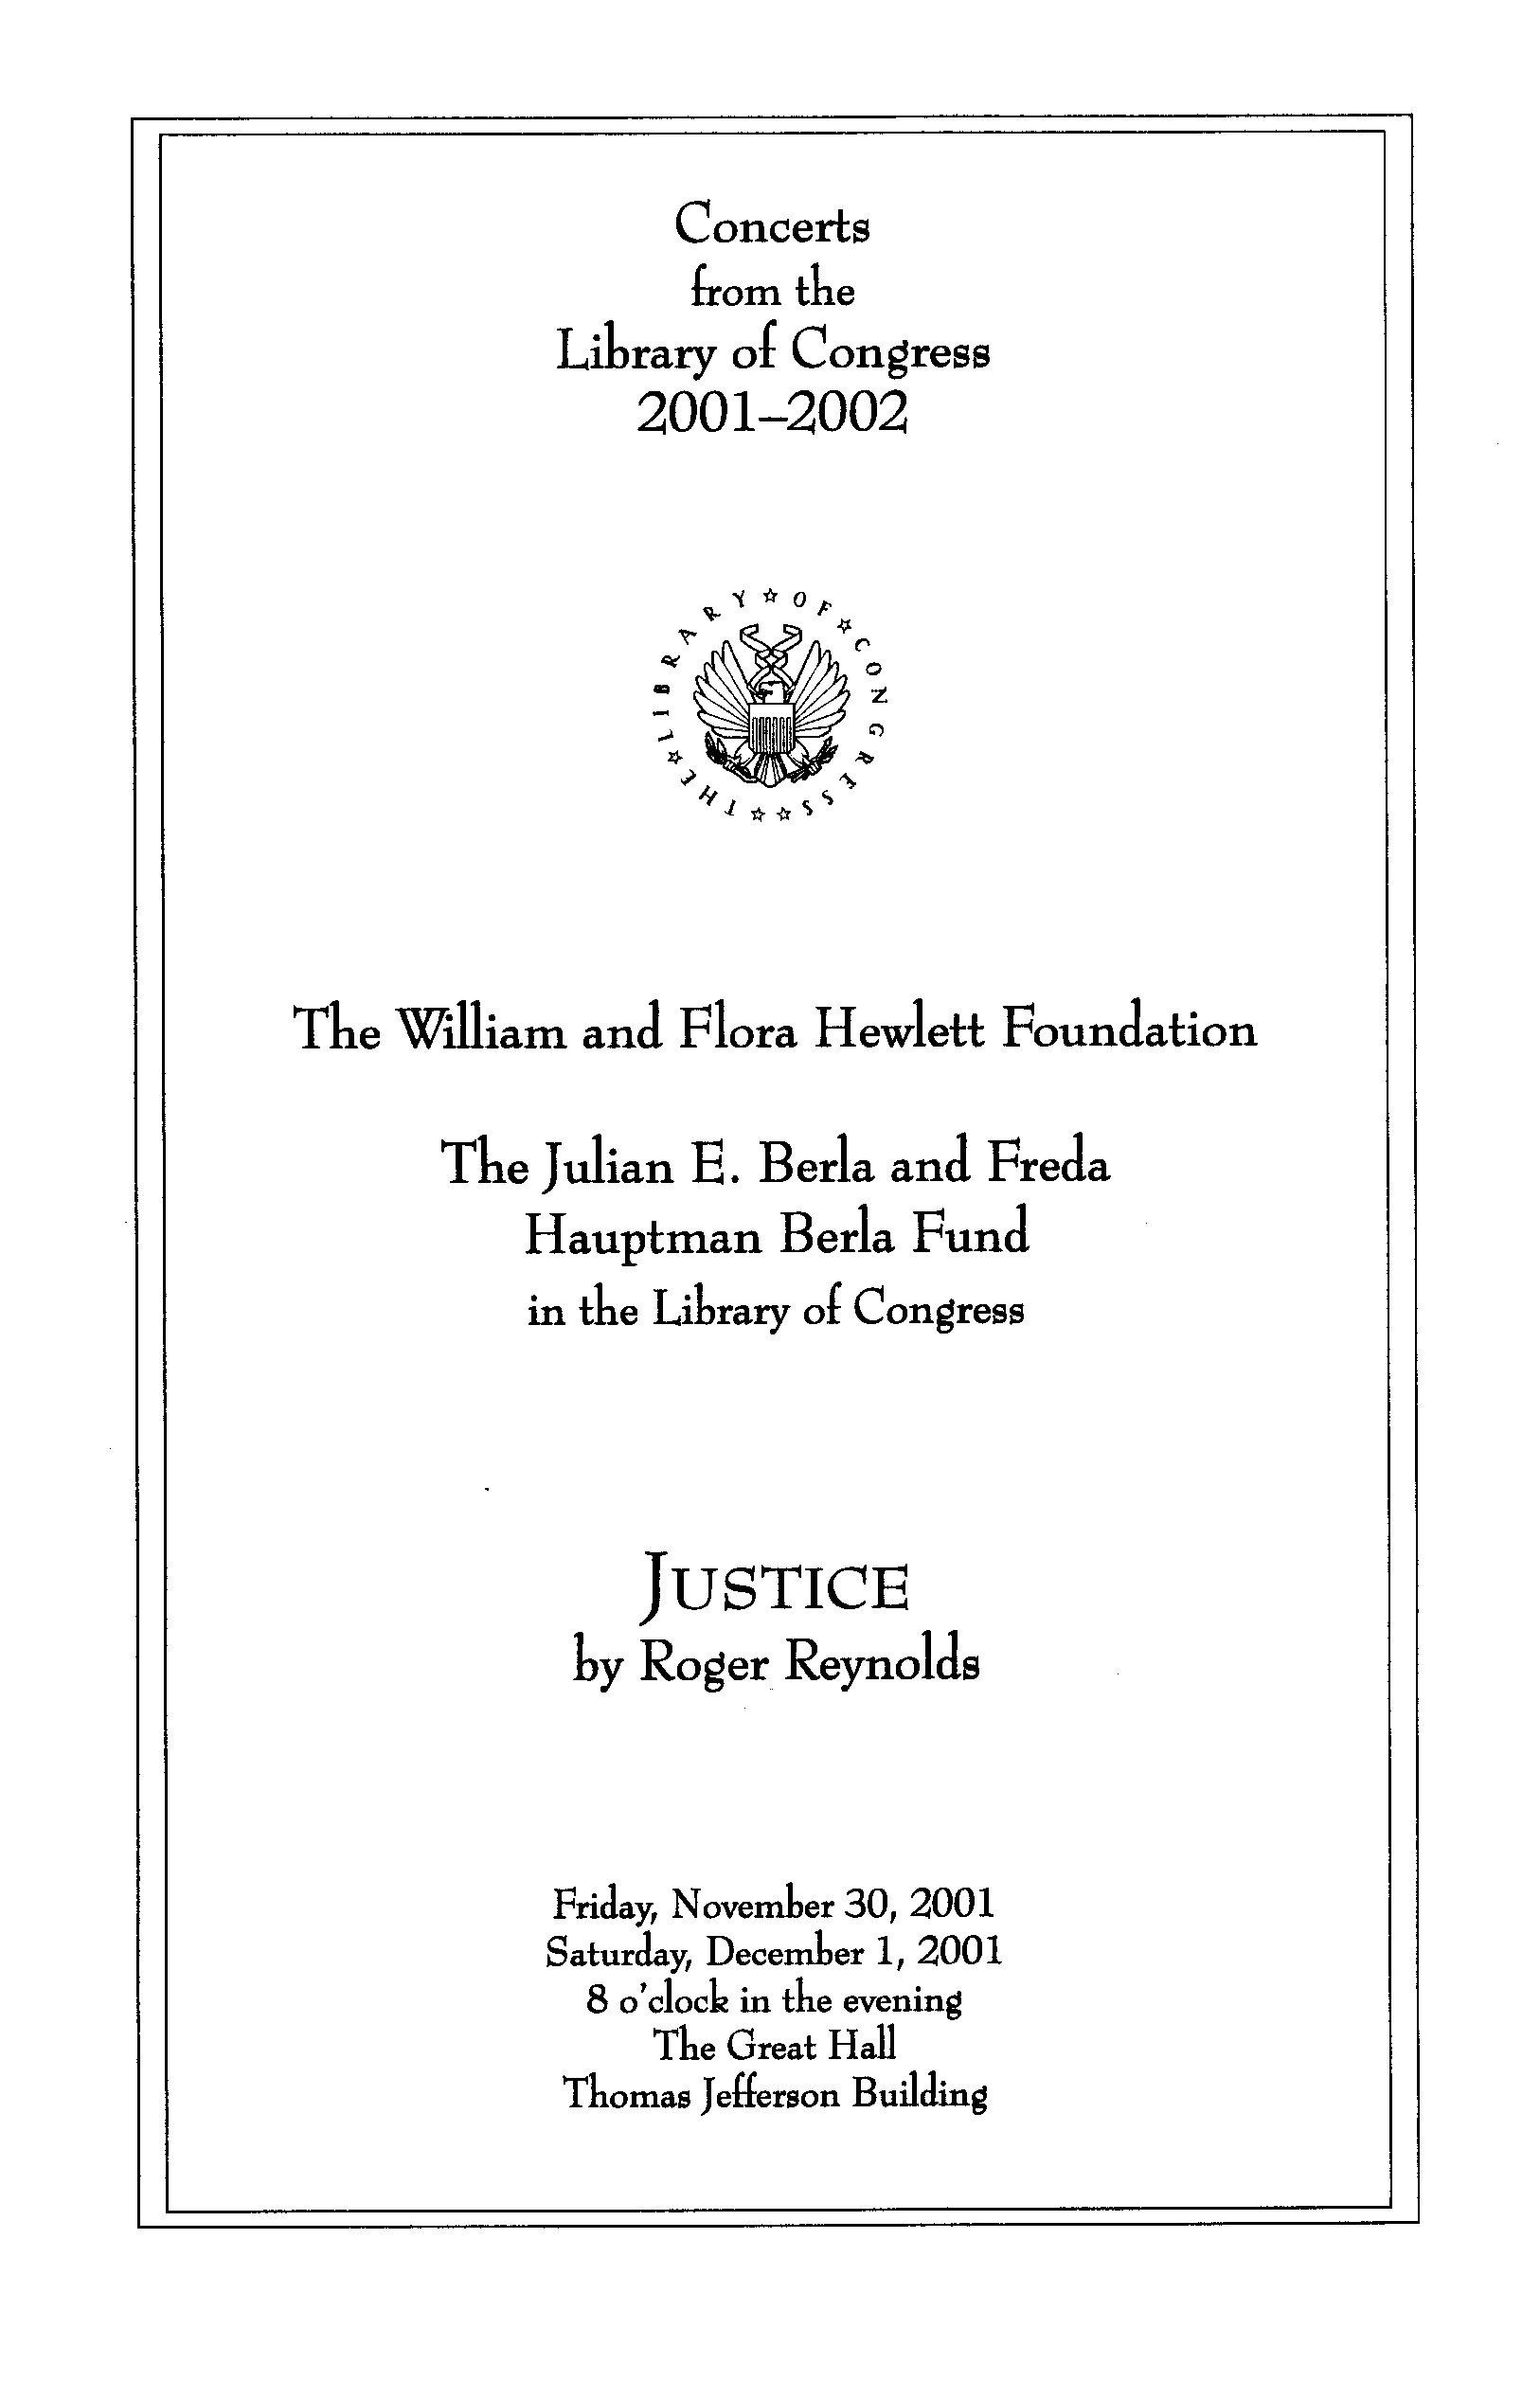 2001 Justice